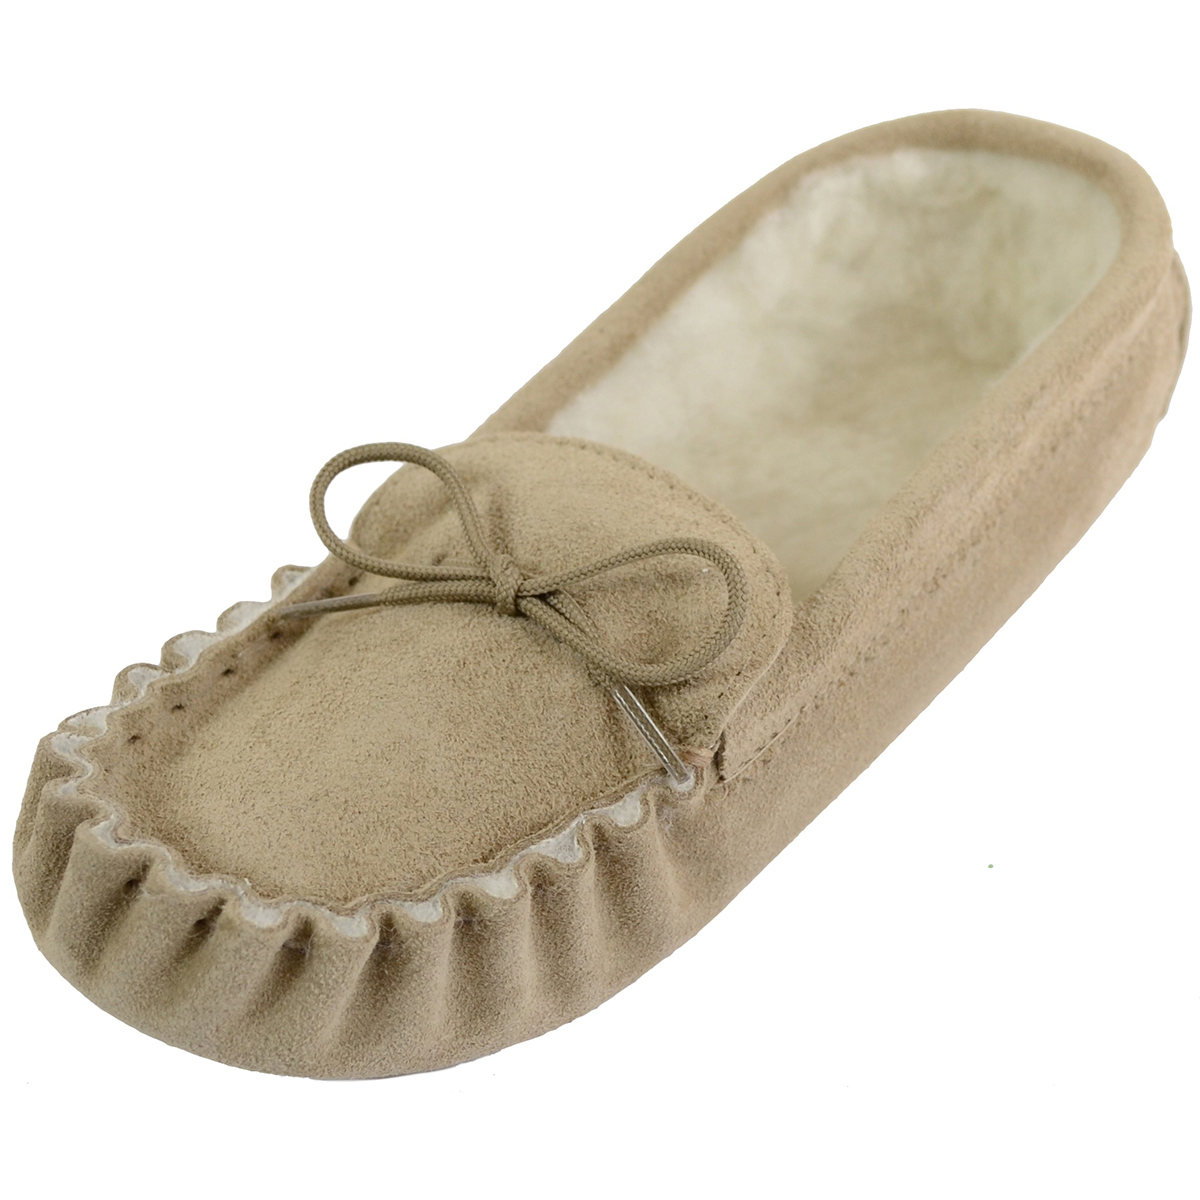 Snugrugs - Wool Lined Suede Sole Moccasins - Beige